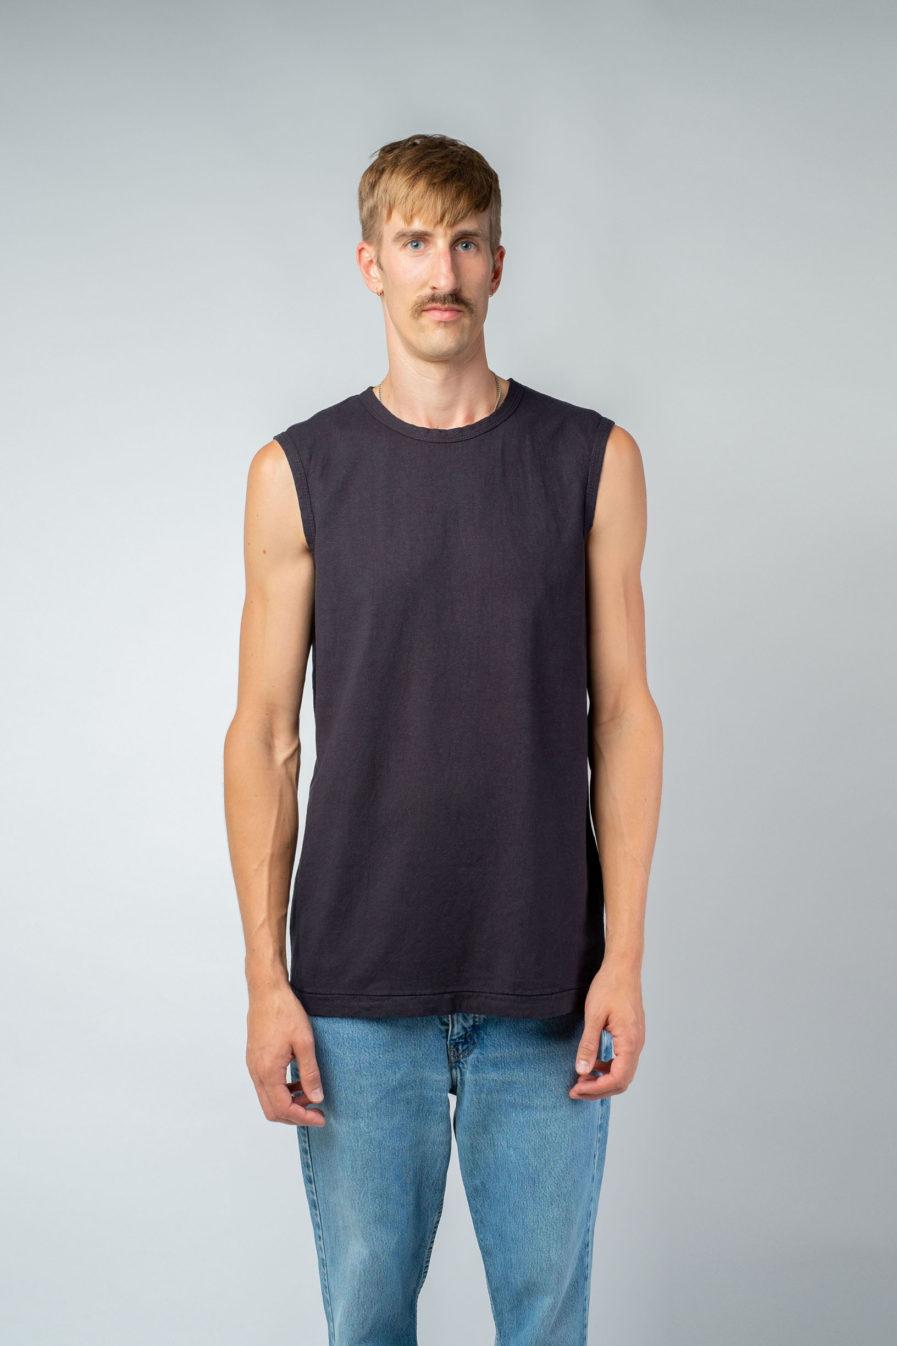 MAN unisex singlet tanktop hemp organic cotton VALENTIJN Carbon black front